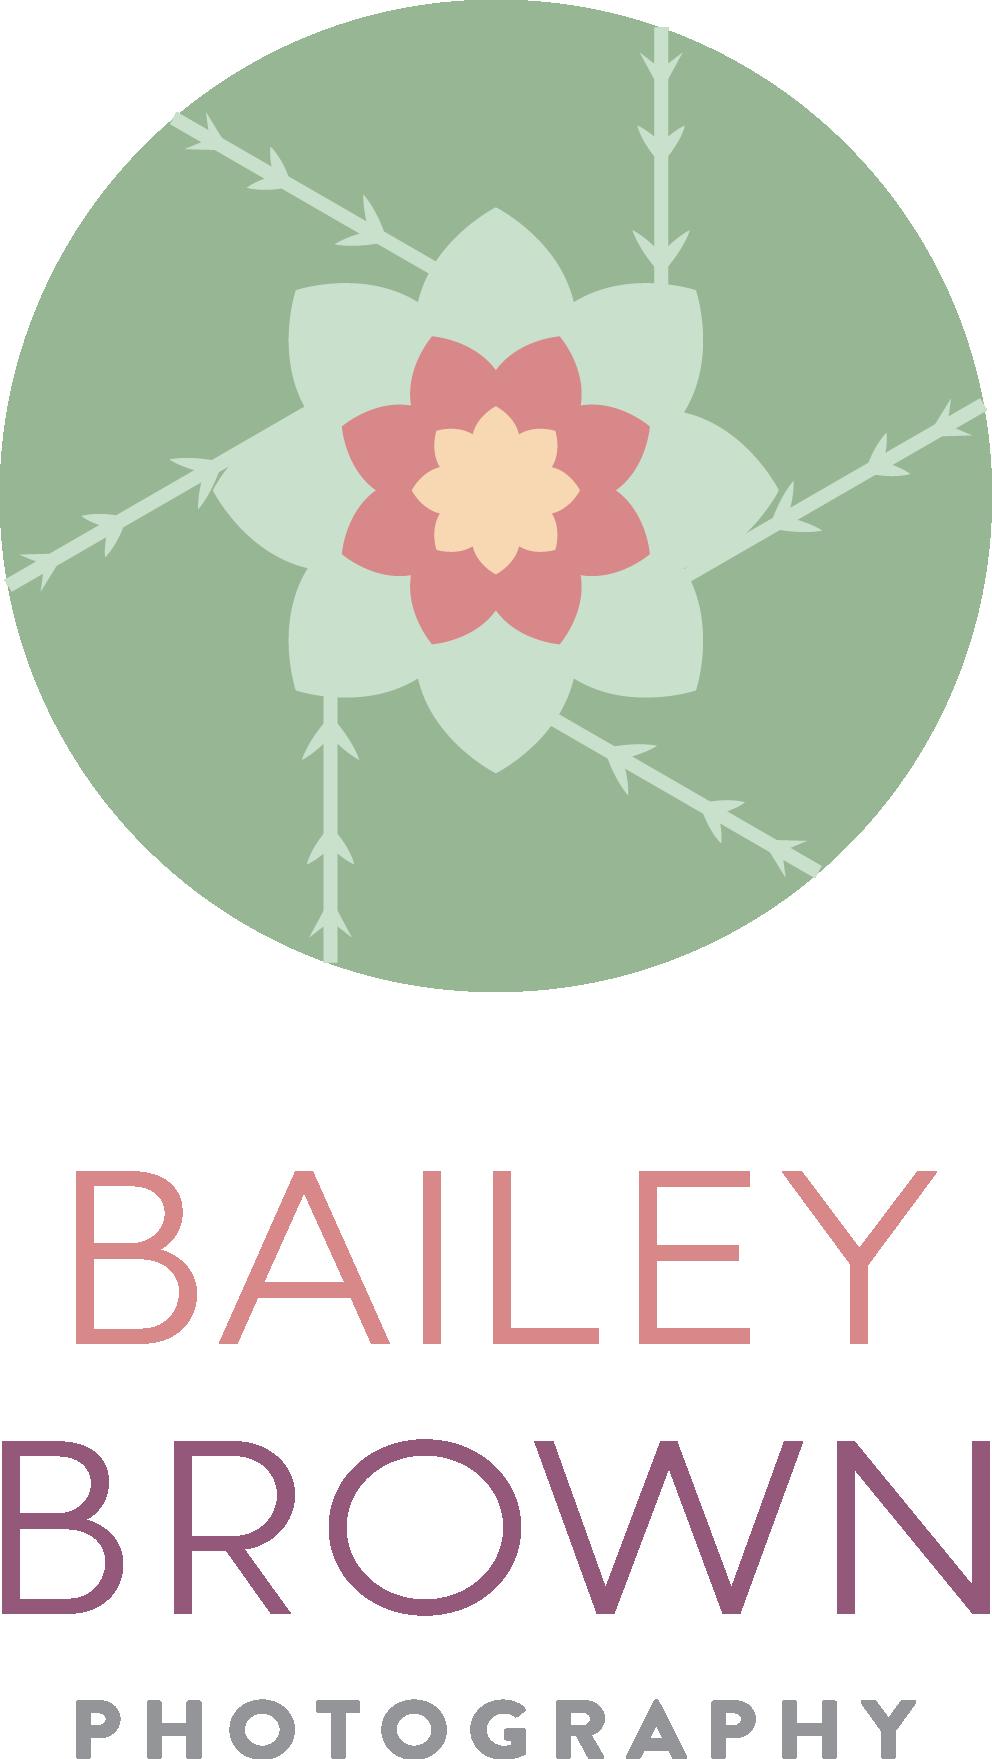 Bailey Brown Photography PHX, AZ